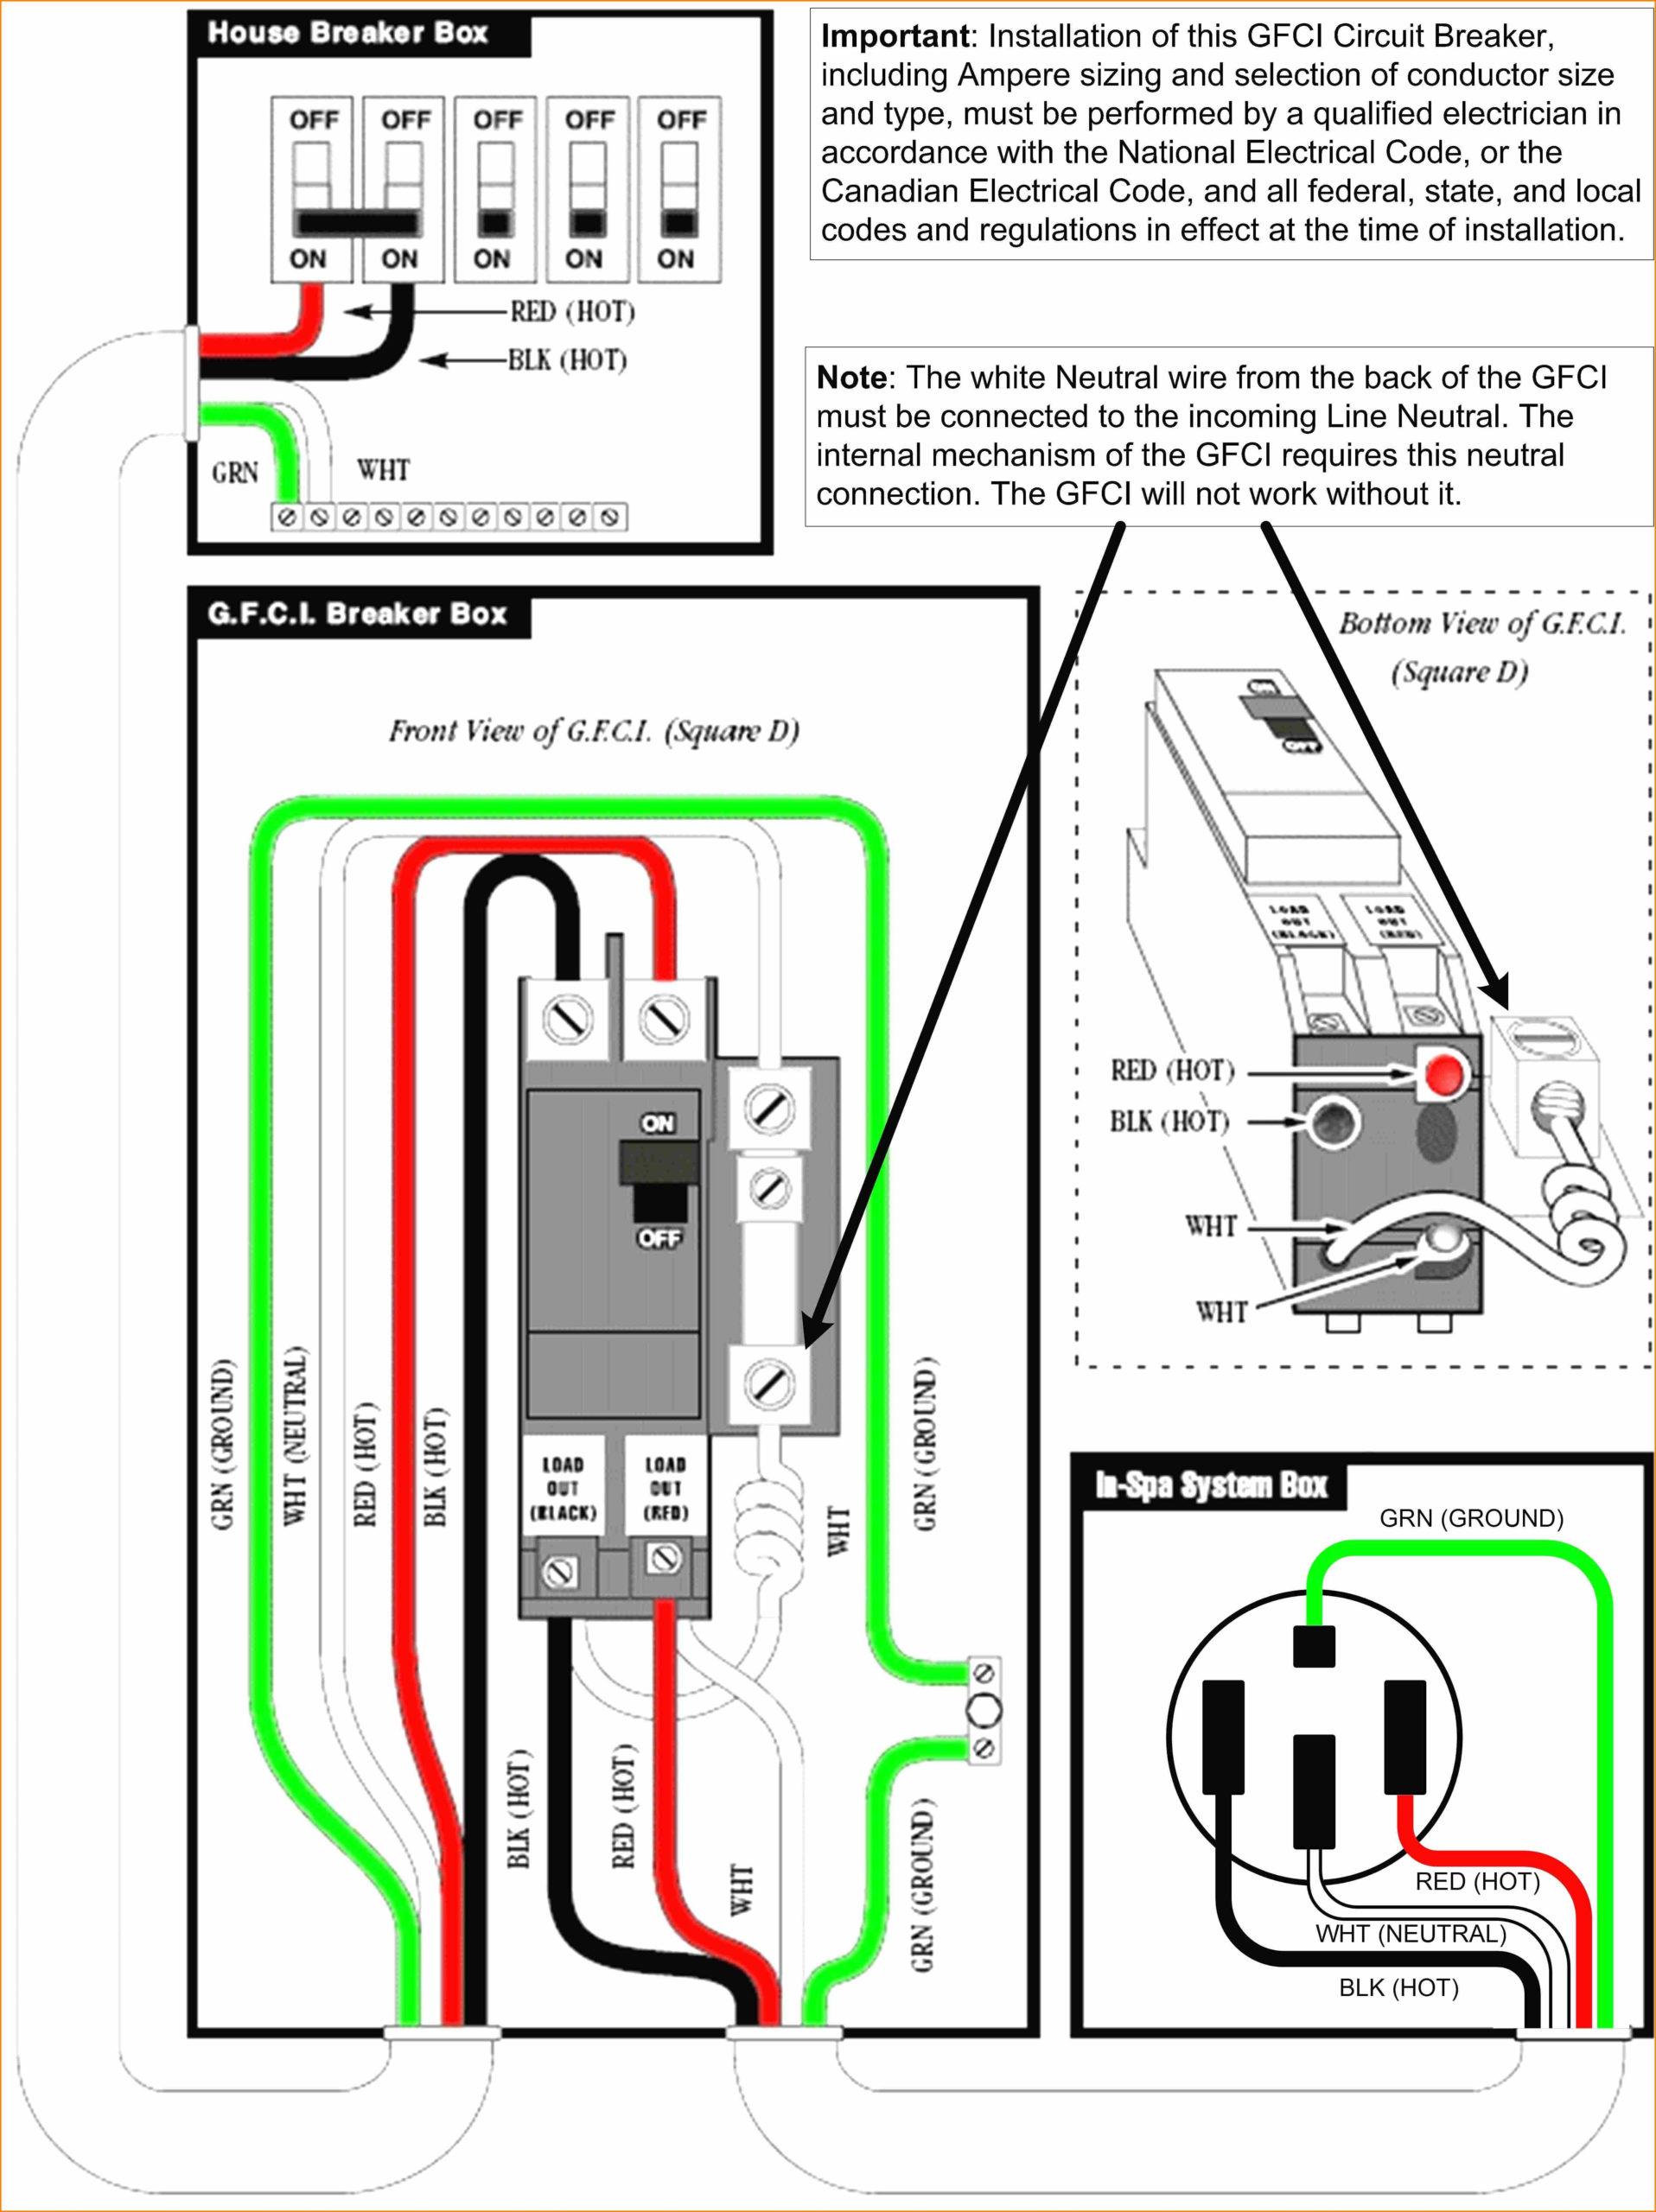 Unique Wiring Diagram Switch Outlet #diagram #wiringdiagram | Wiring Diagram For Outlet